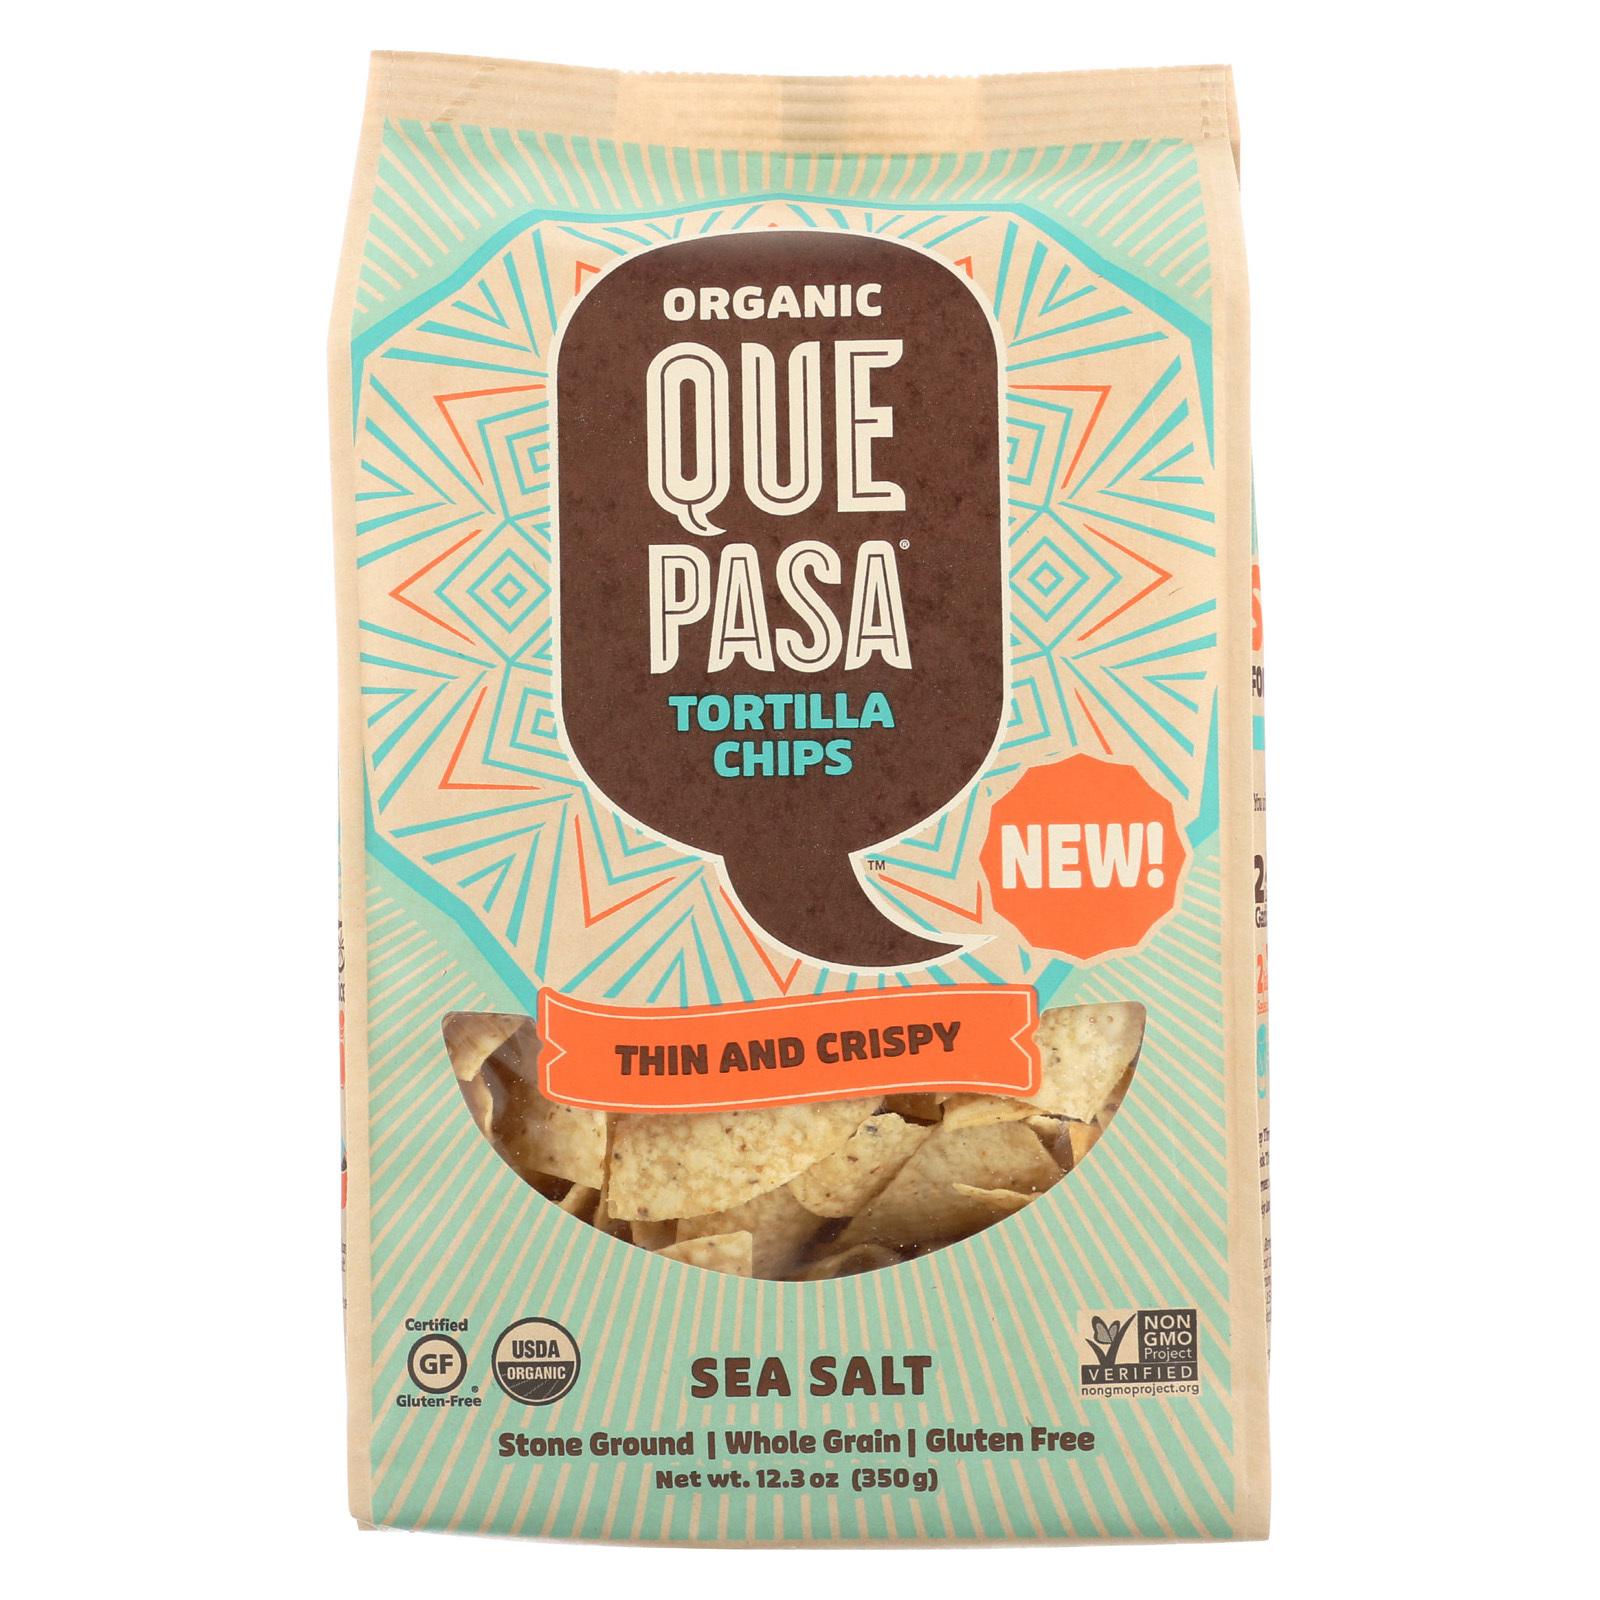 Que Pasa Tort Chip - Organic - Thin - Sea Salt - Case of 12 - 12.3 oz